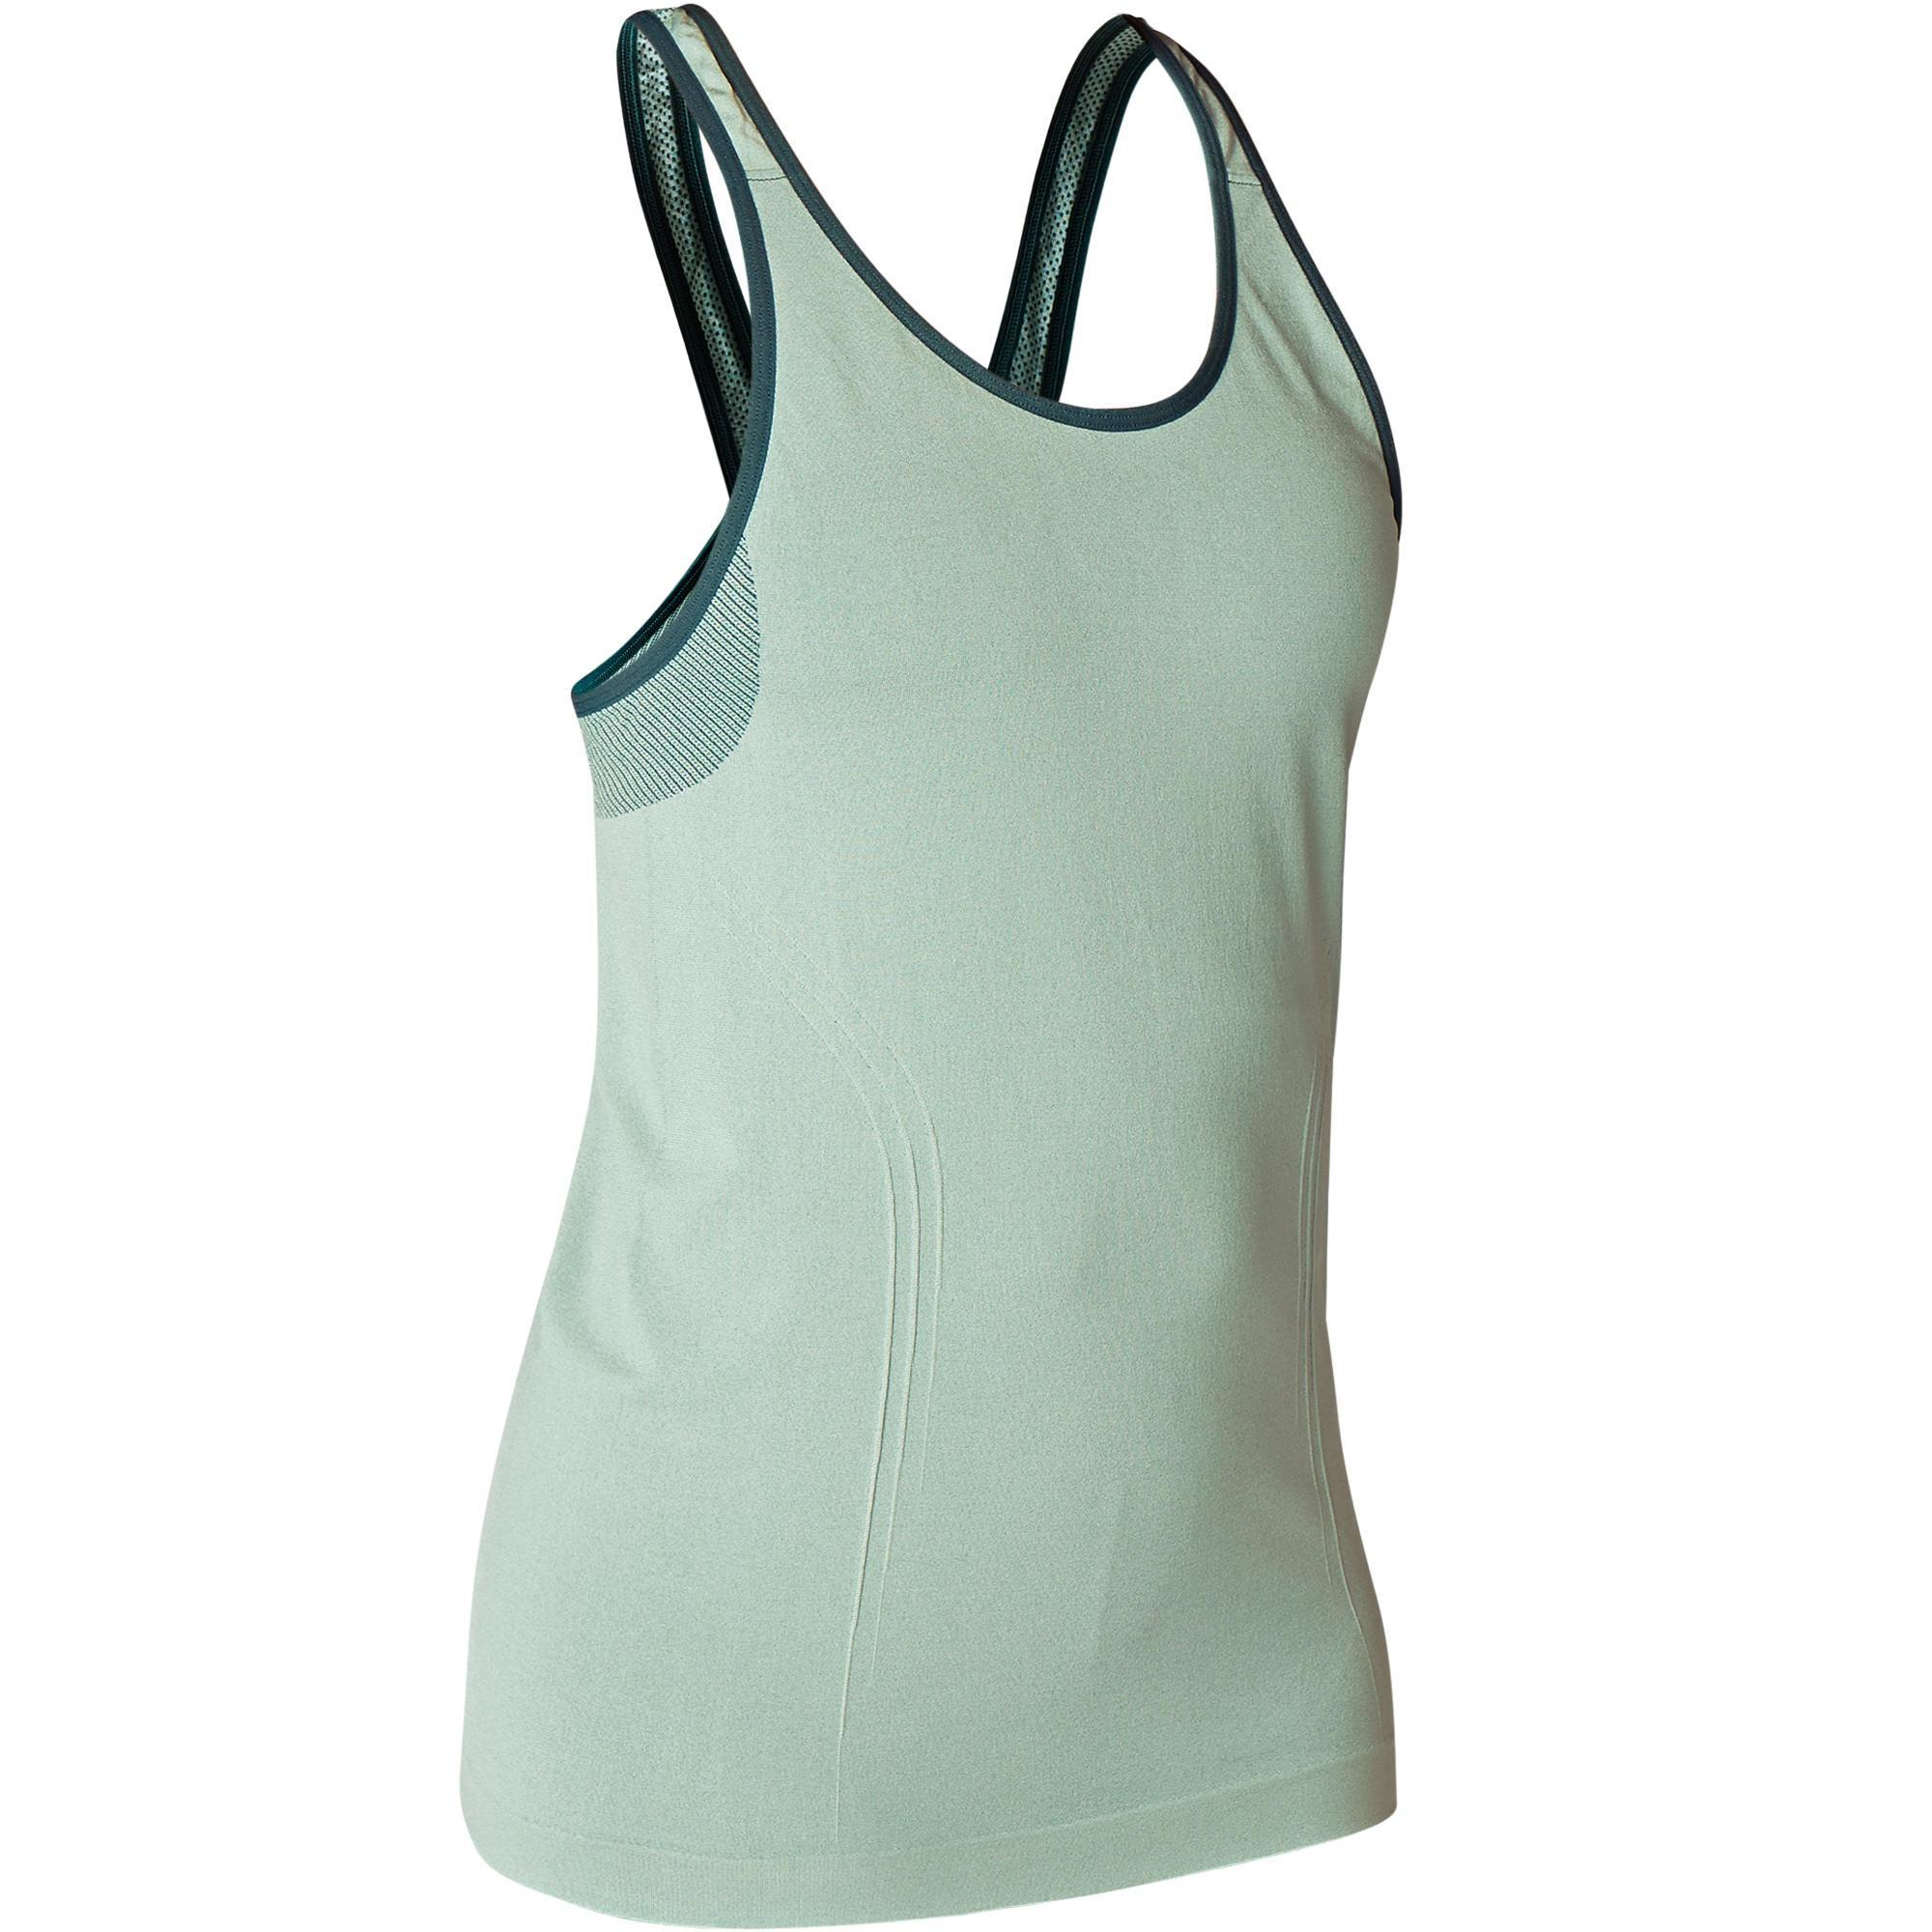 Top Yoga nahtlos für dynamisches Yoga grün | Sportbekleidung > Sporttops > Yogatops | Grün - Khaki | Domyos